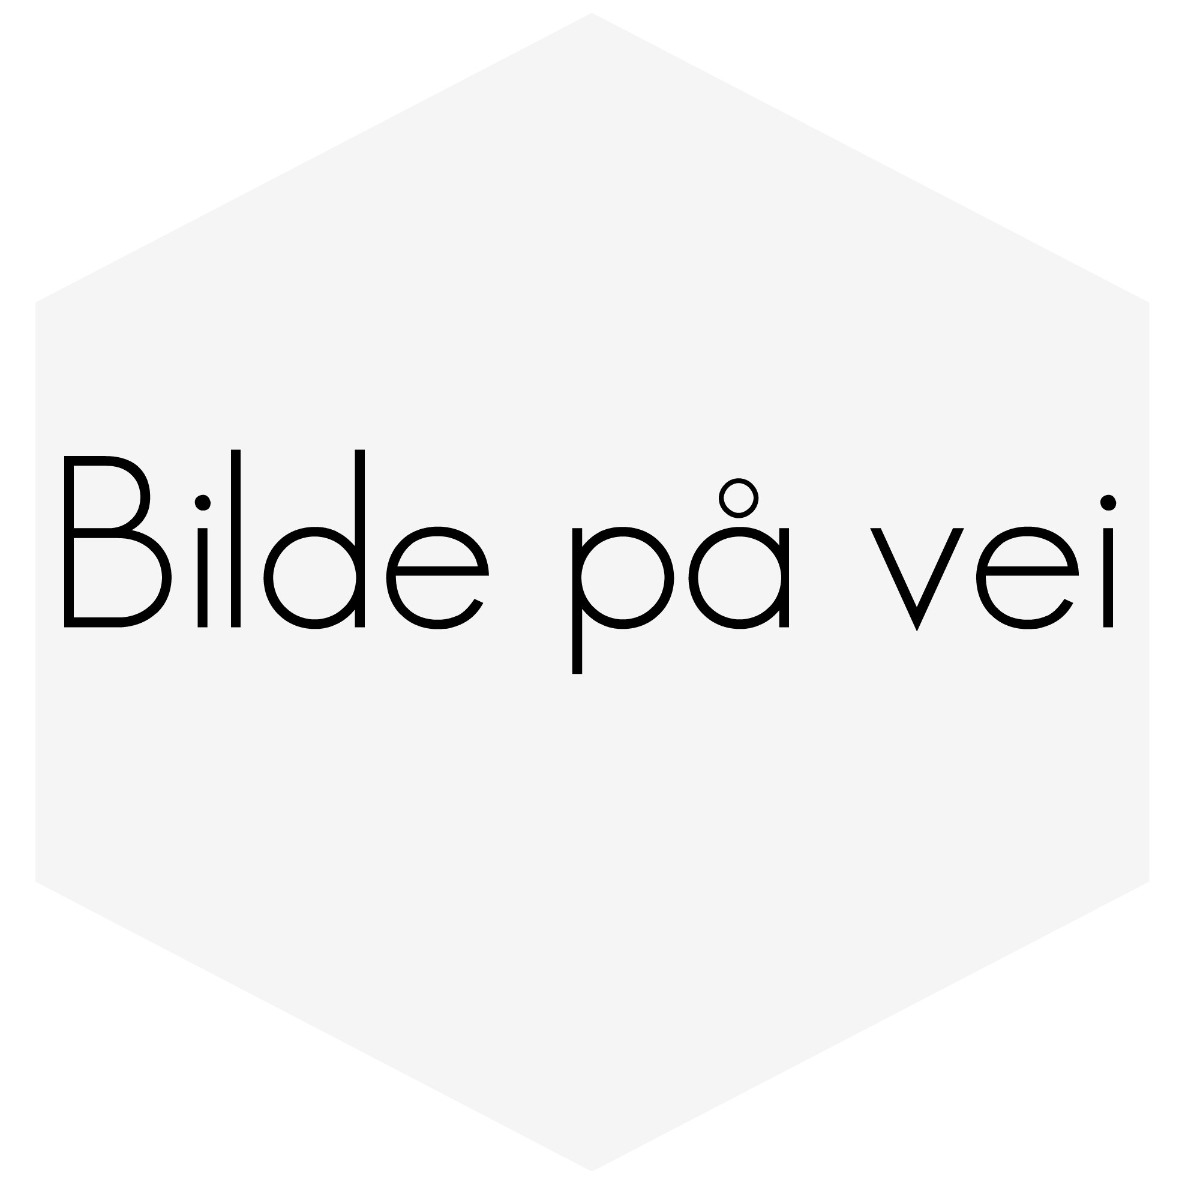 "SILIKONSLANGE SVART FLEKSIBEL 0,5"" (13MM)"